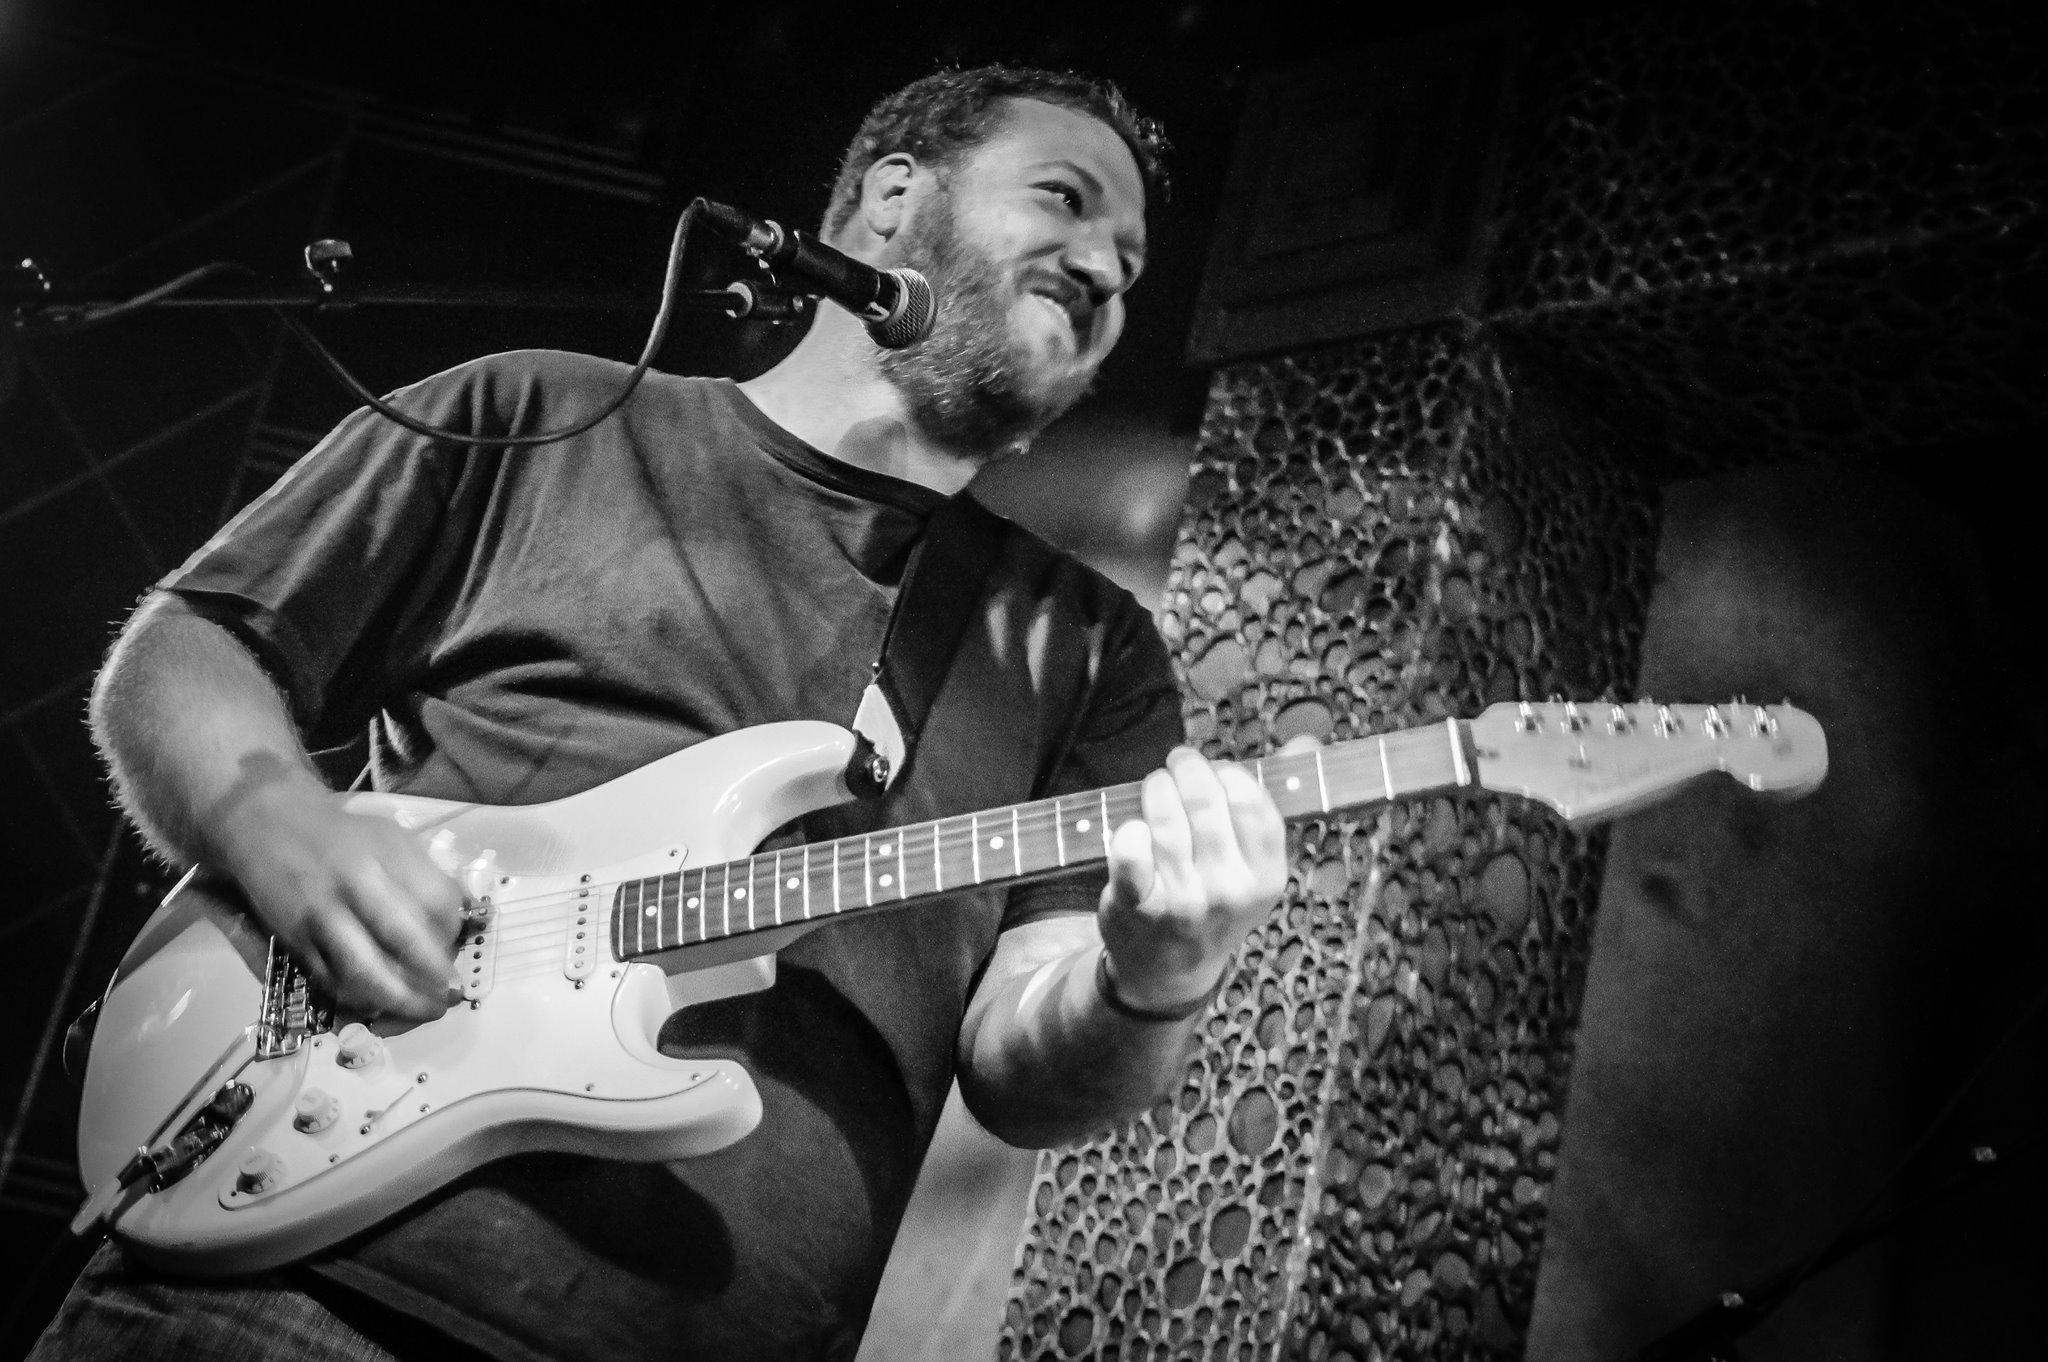 Matt Holloman & The Fumblebuckers - [folk rock/bluegrass]